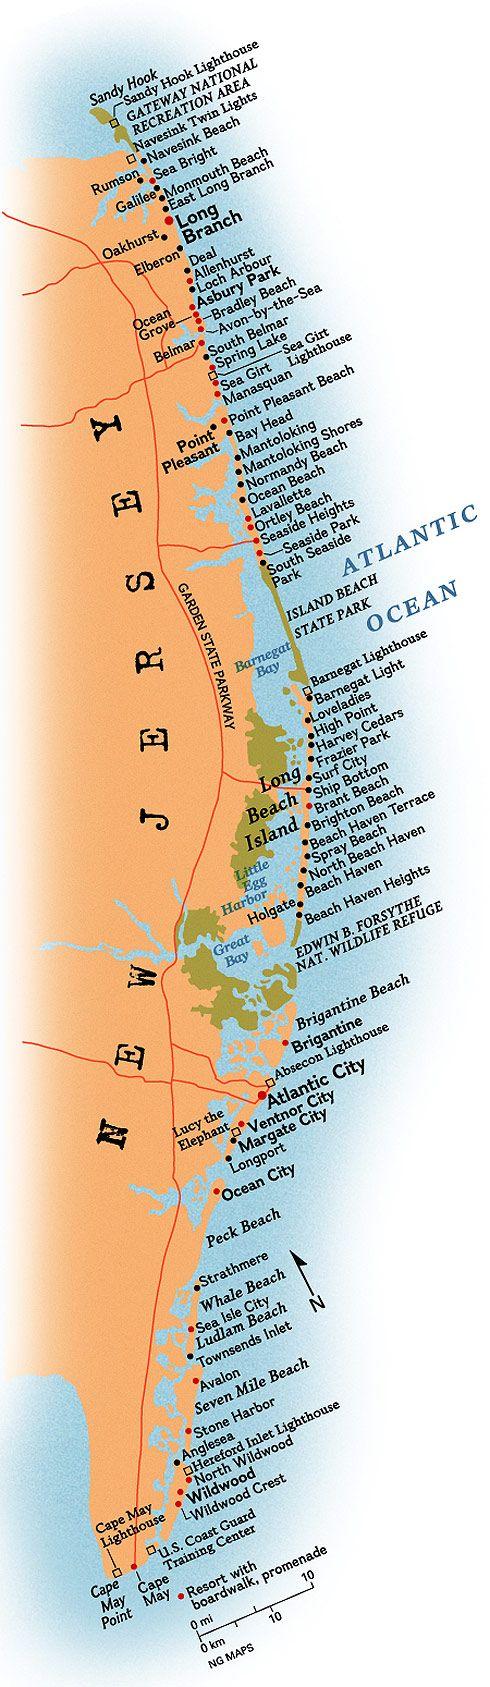 Map Of Jersey Shore Towns : jersey, shore, towns, Jersey, Beach, Weddings,, Weddings, Beaches,, Shore,, Wildwood